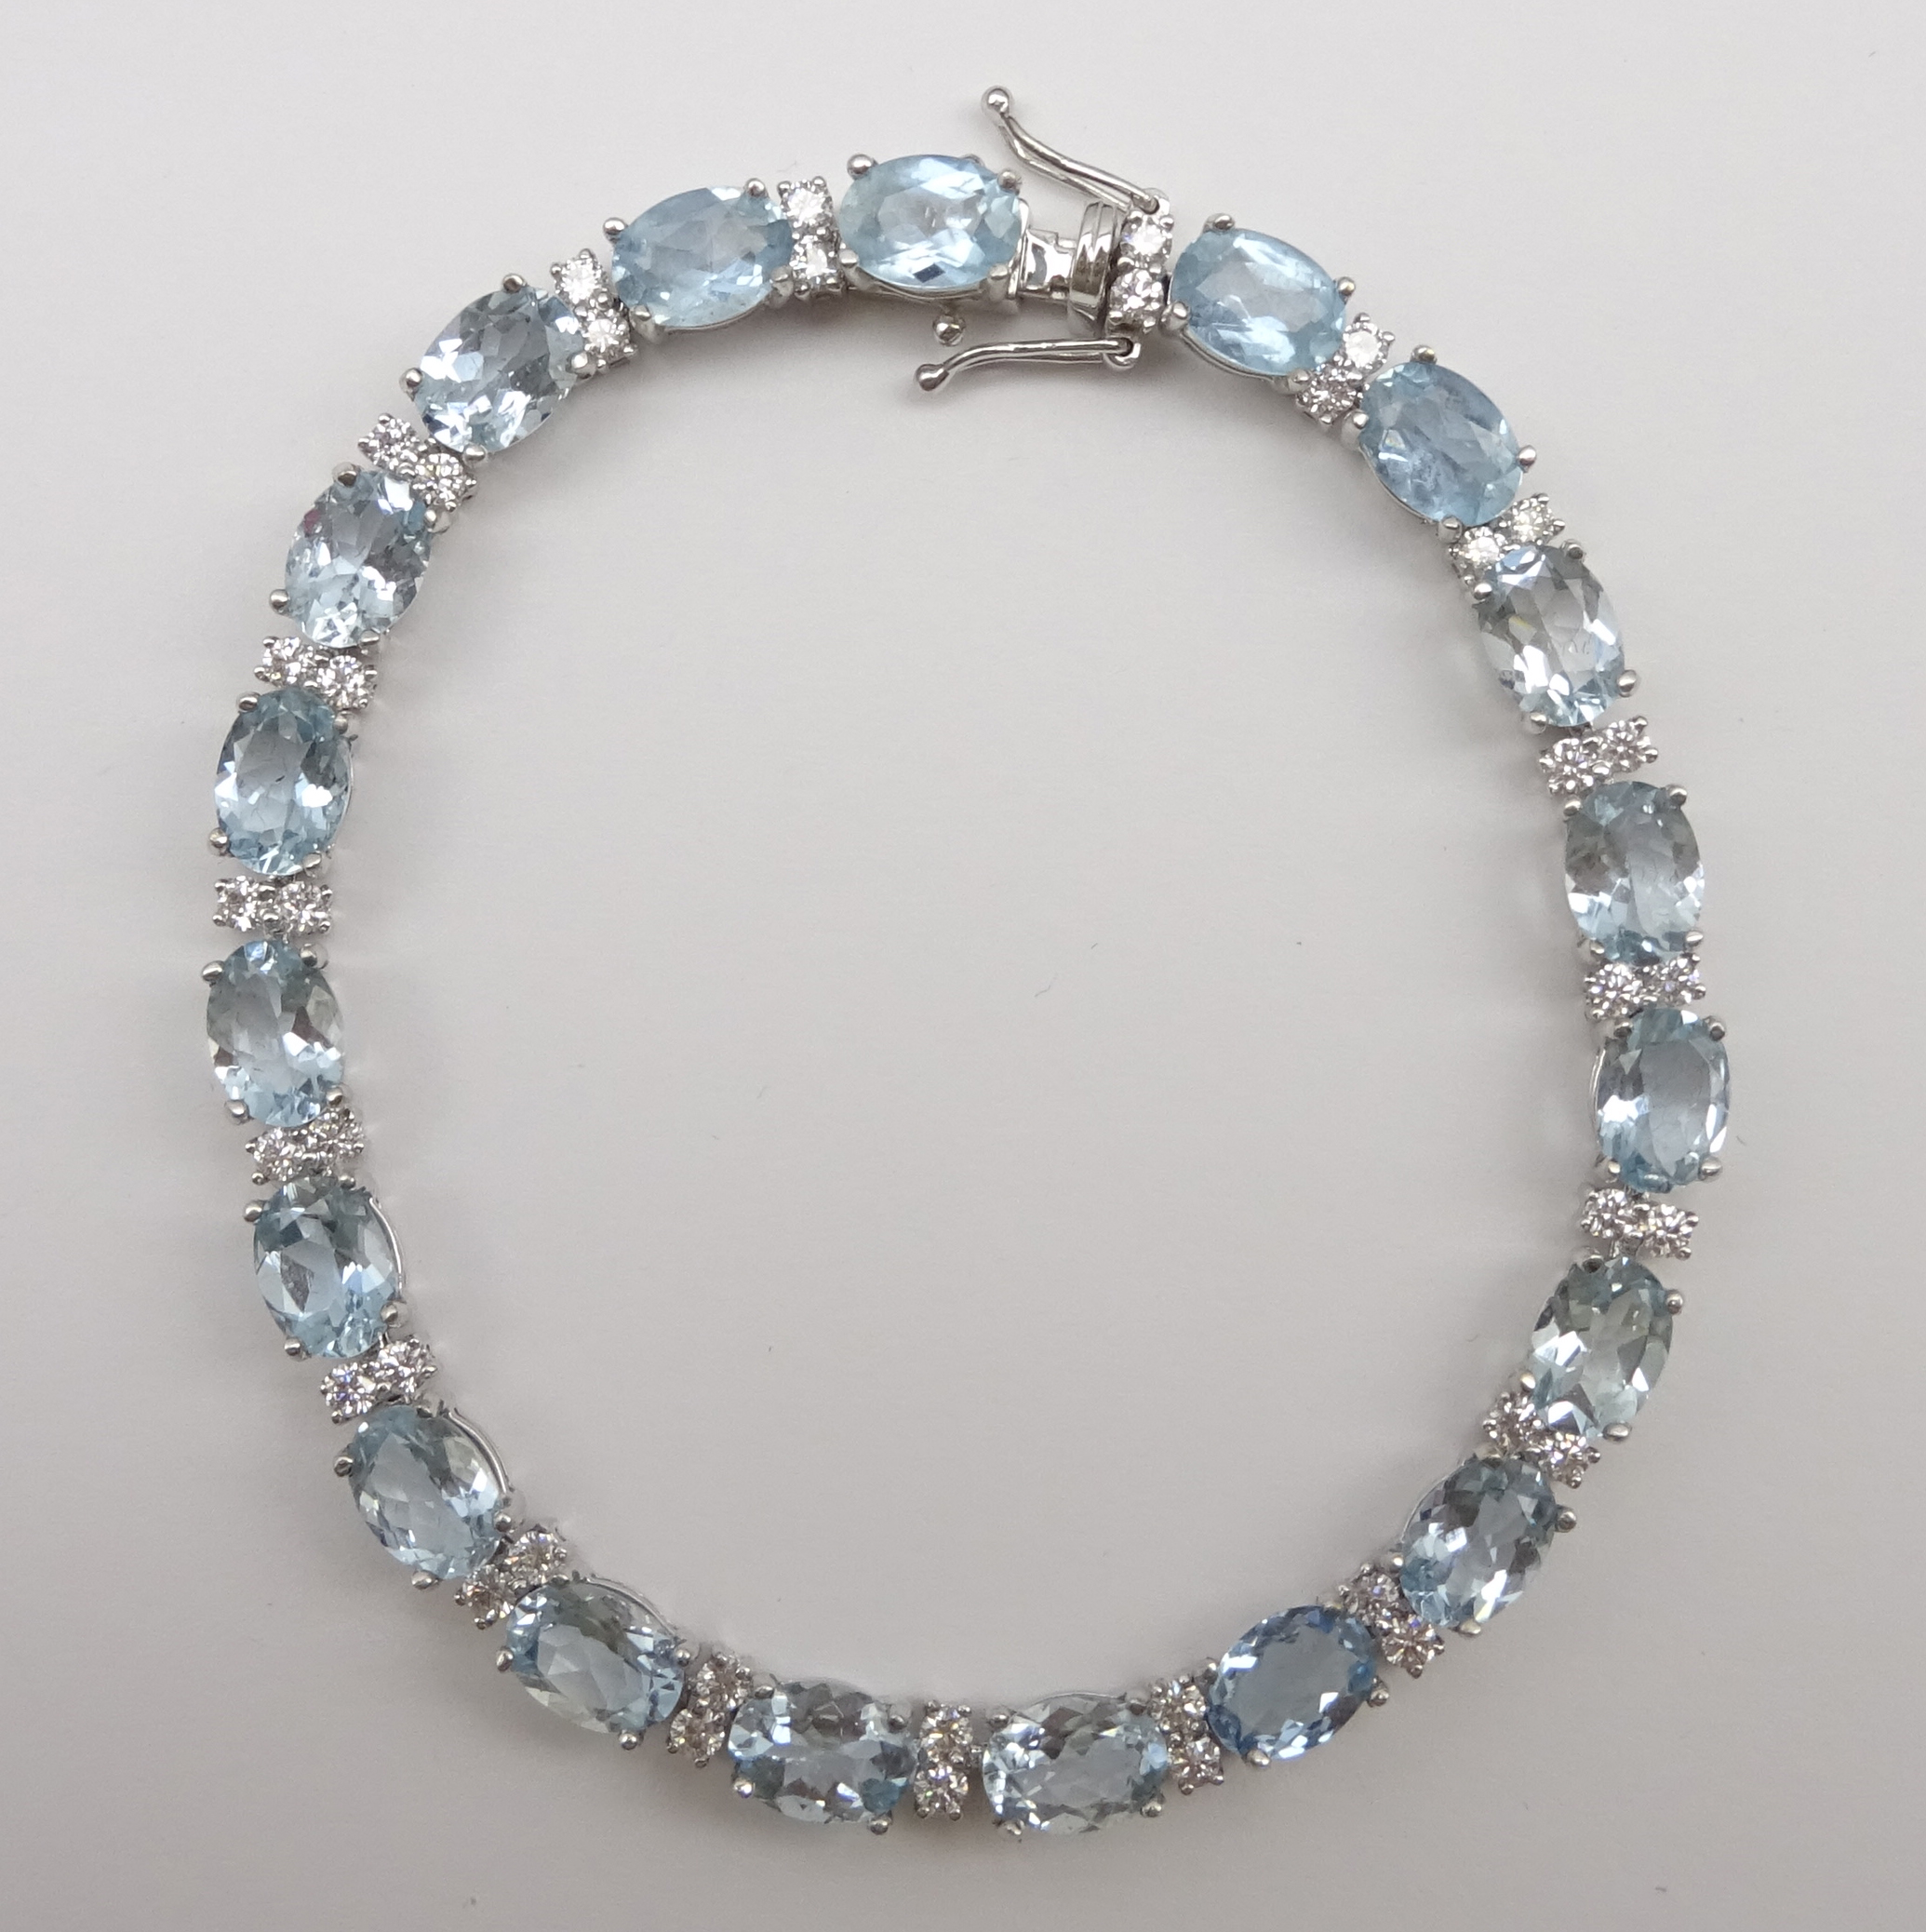 Lot 1039 - 18ct white gold aquamarine and diamond bracelet, stamped 750, aquamarine total weight 12.